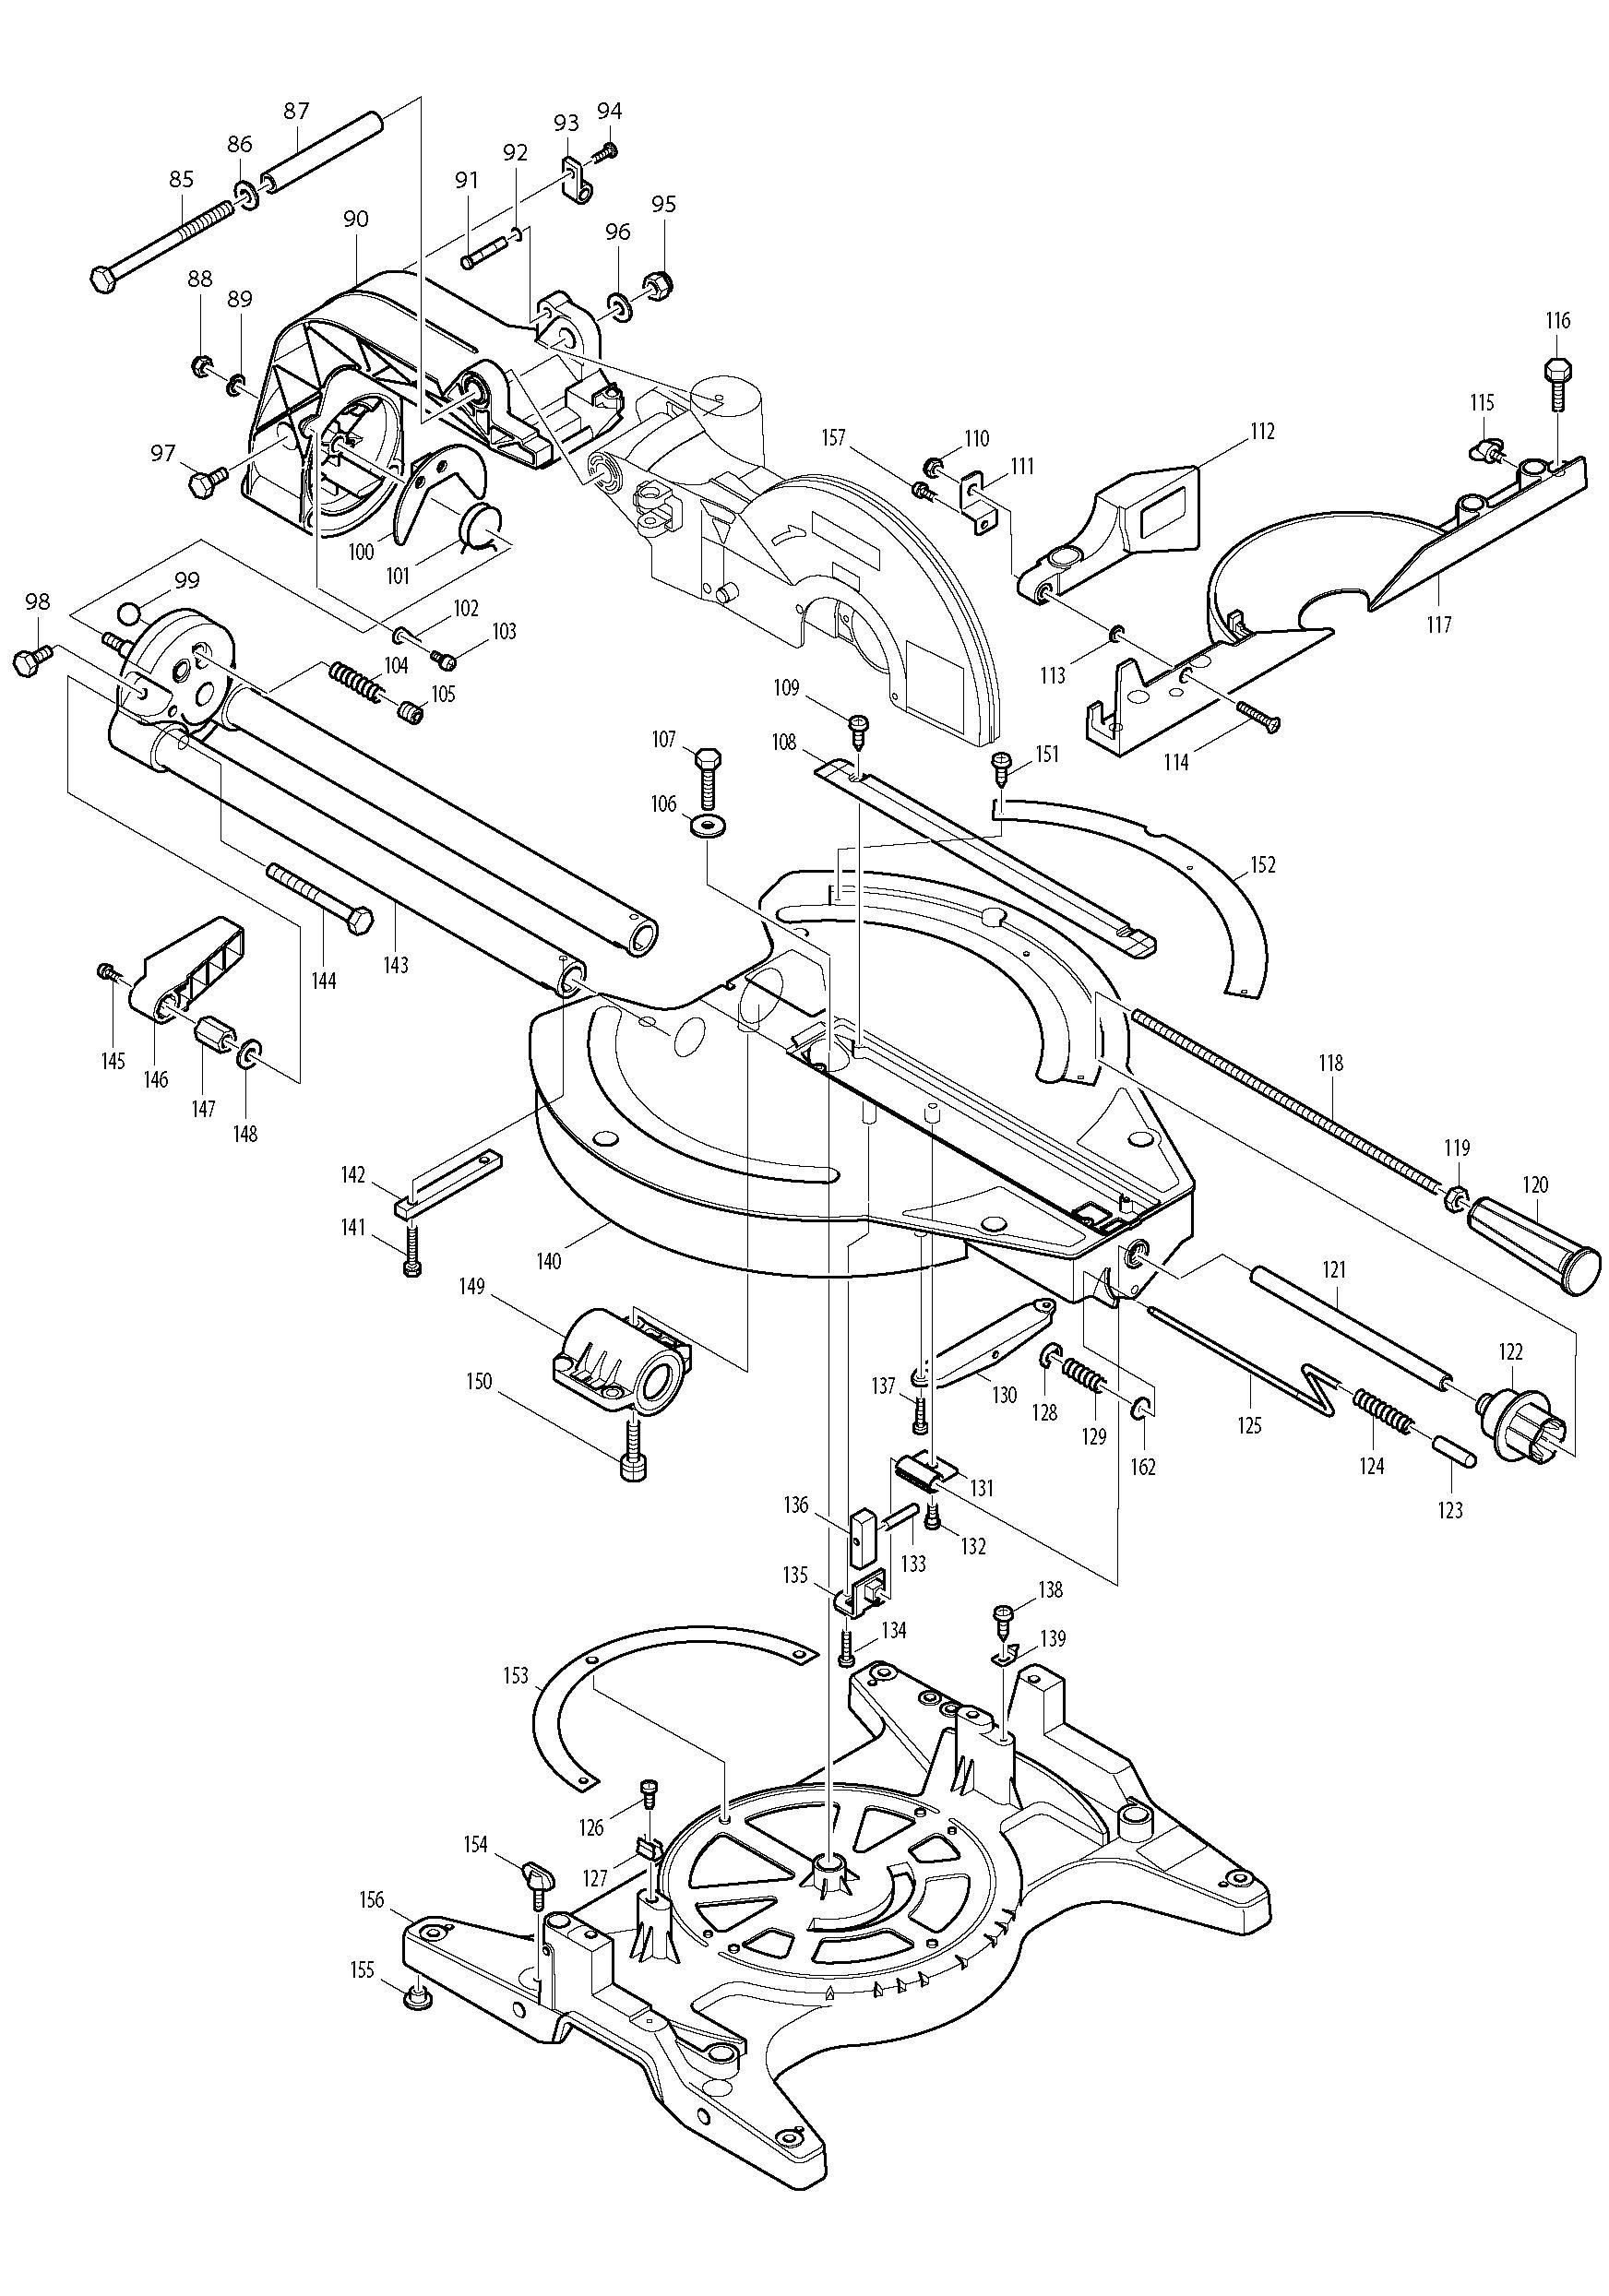 skil circular saw wiring diagram skil circular saw accessories elsavadorla